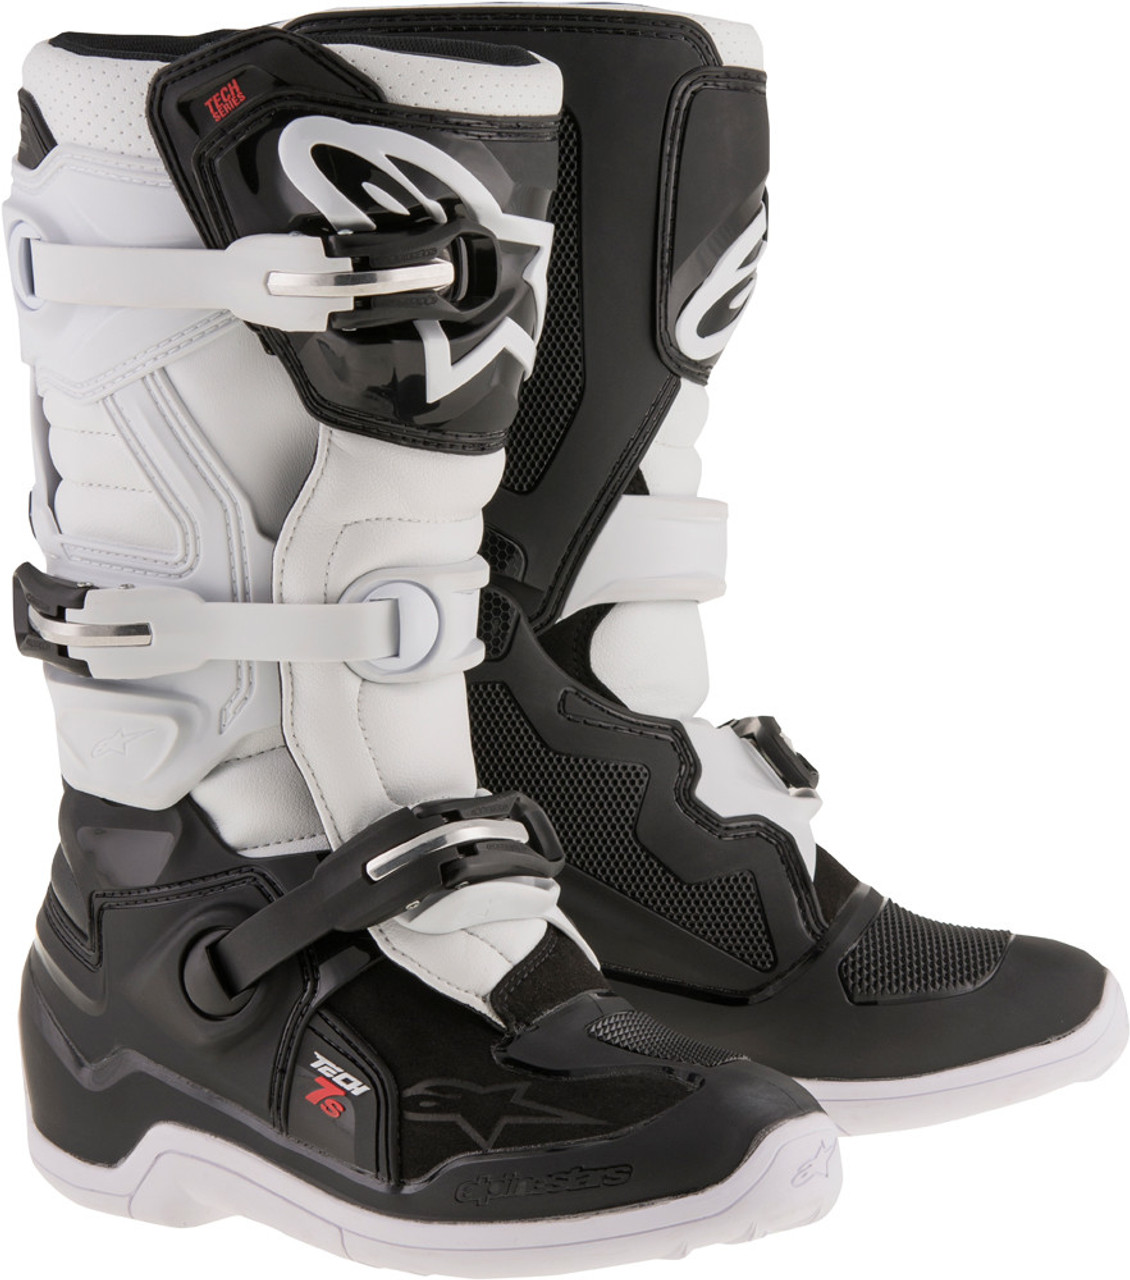 2e3b515132fa53 Alpinestars Tech 7S Youth Boots Black White - Speed Addicts